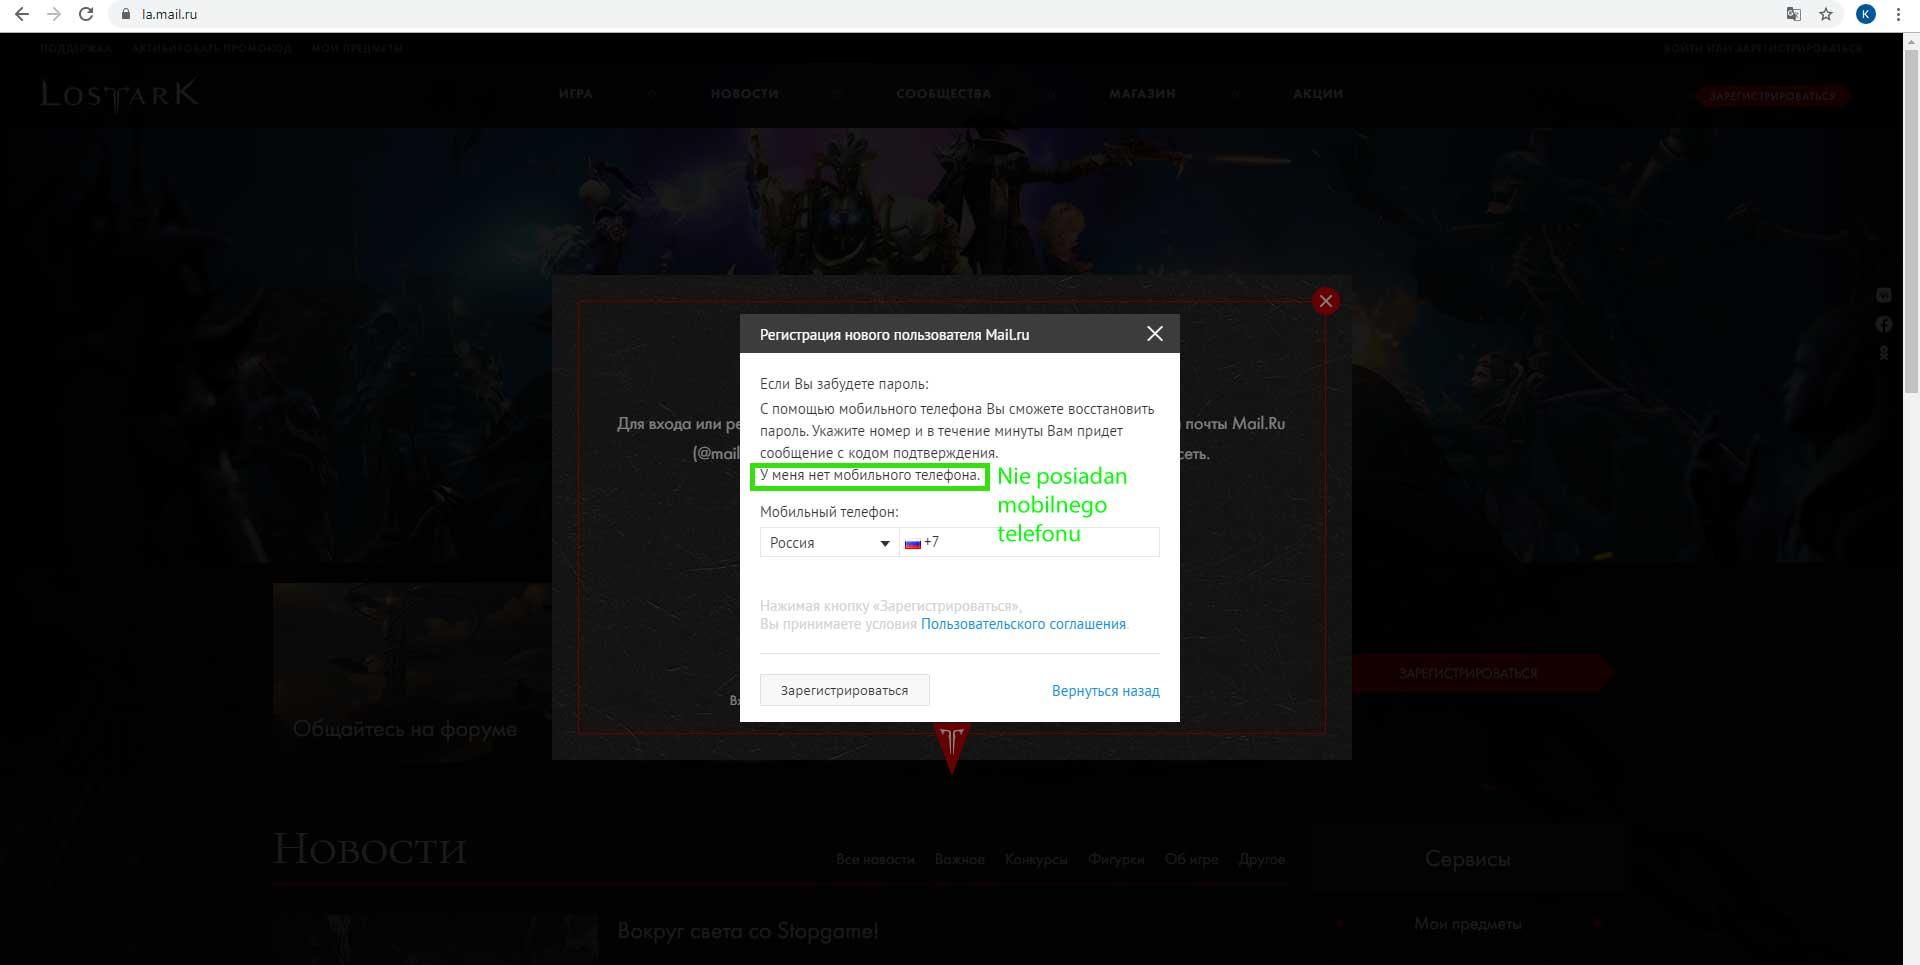 Jak zagrać w Lost Ark Online?